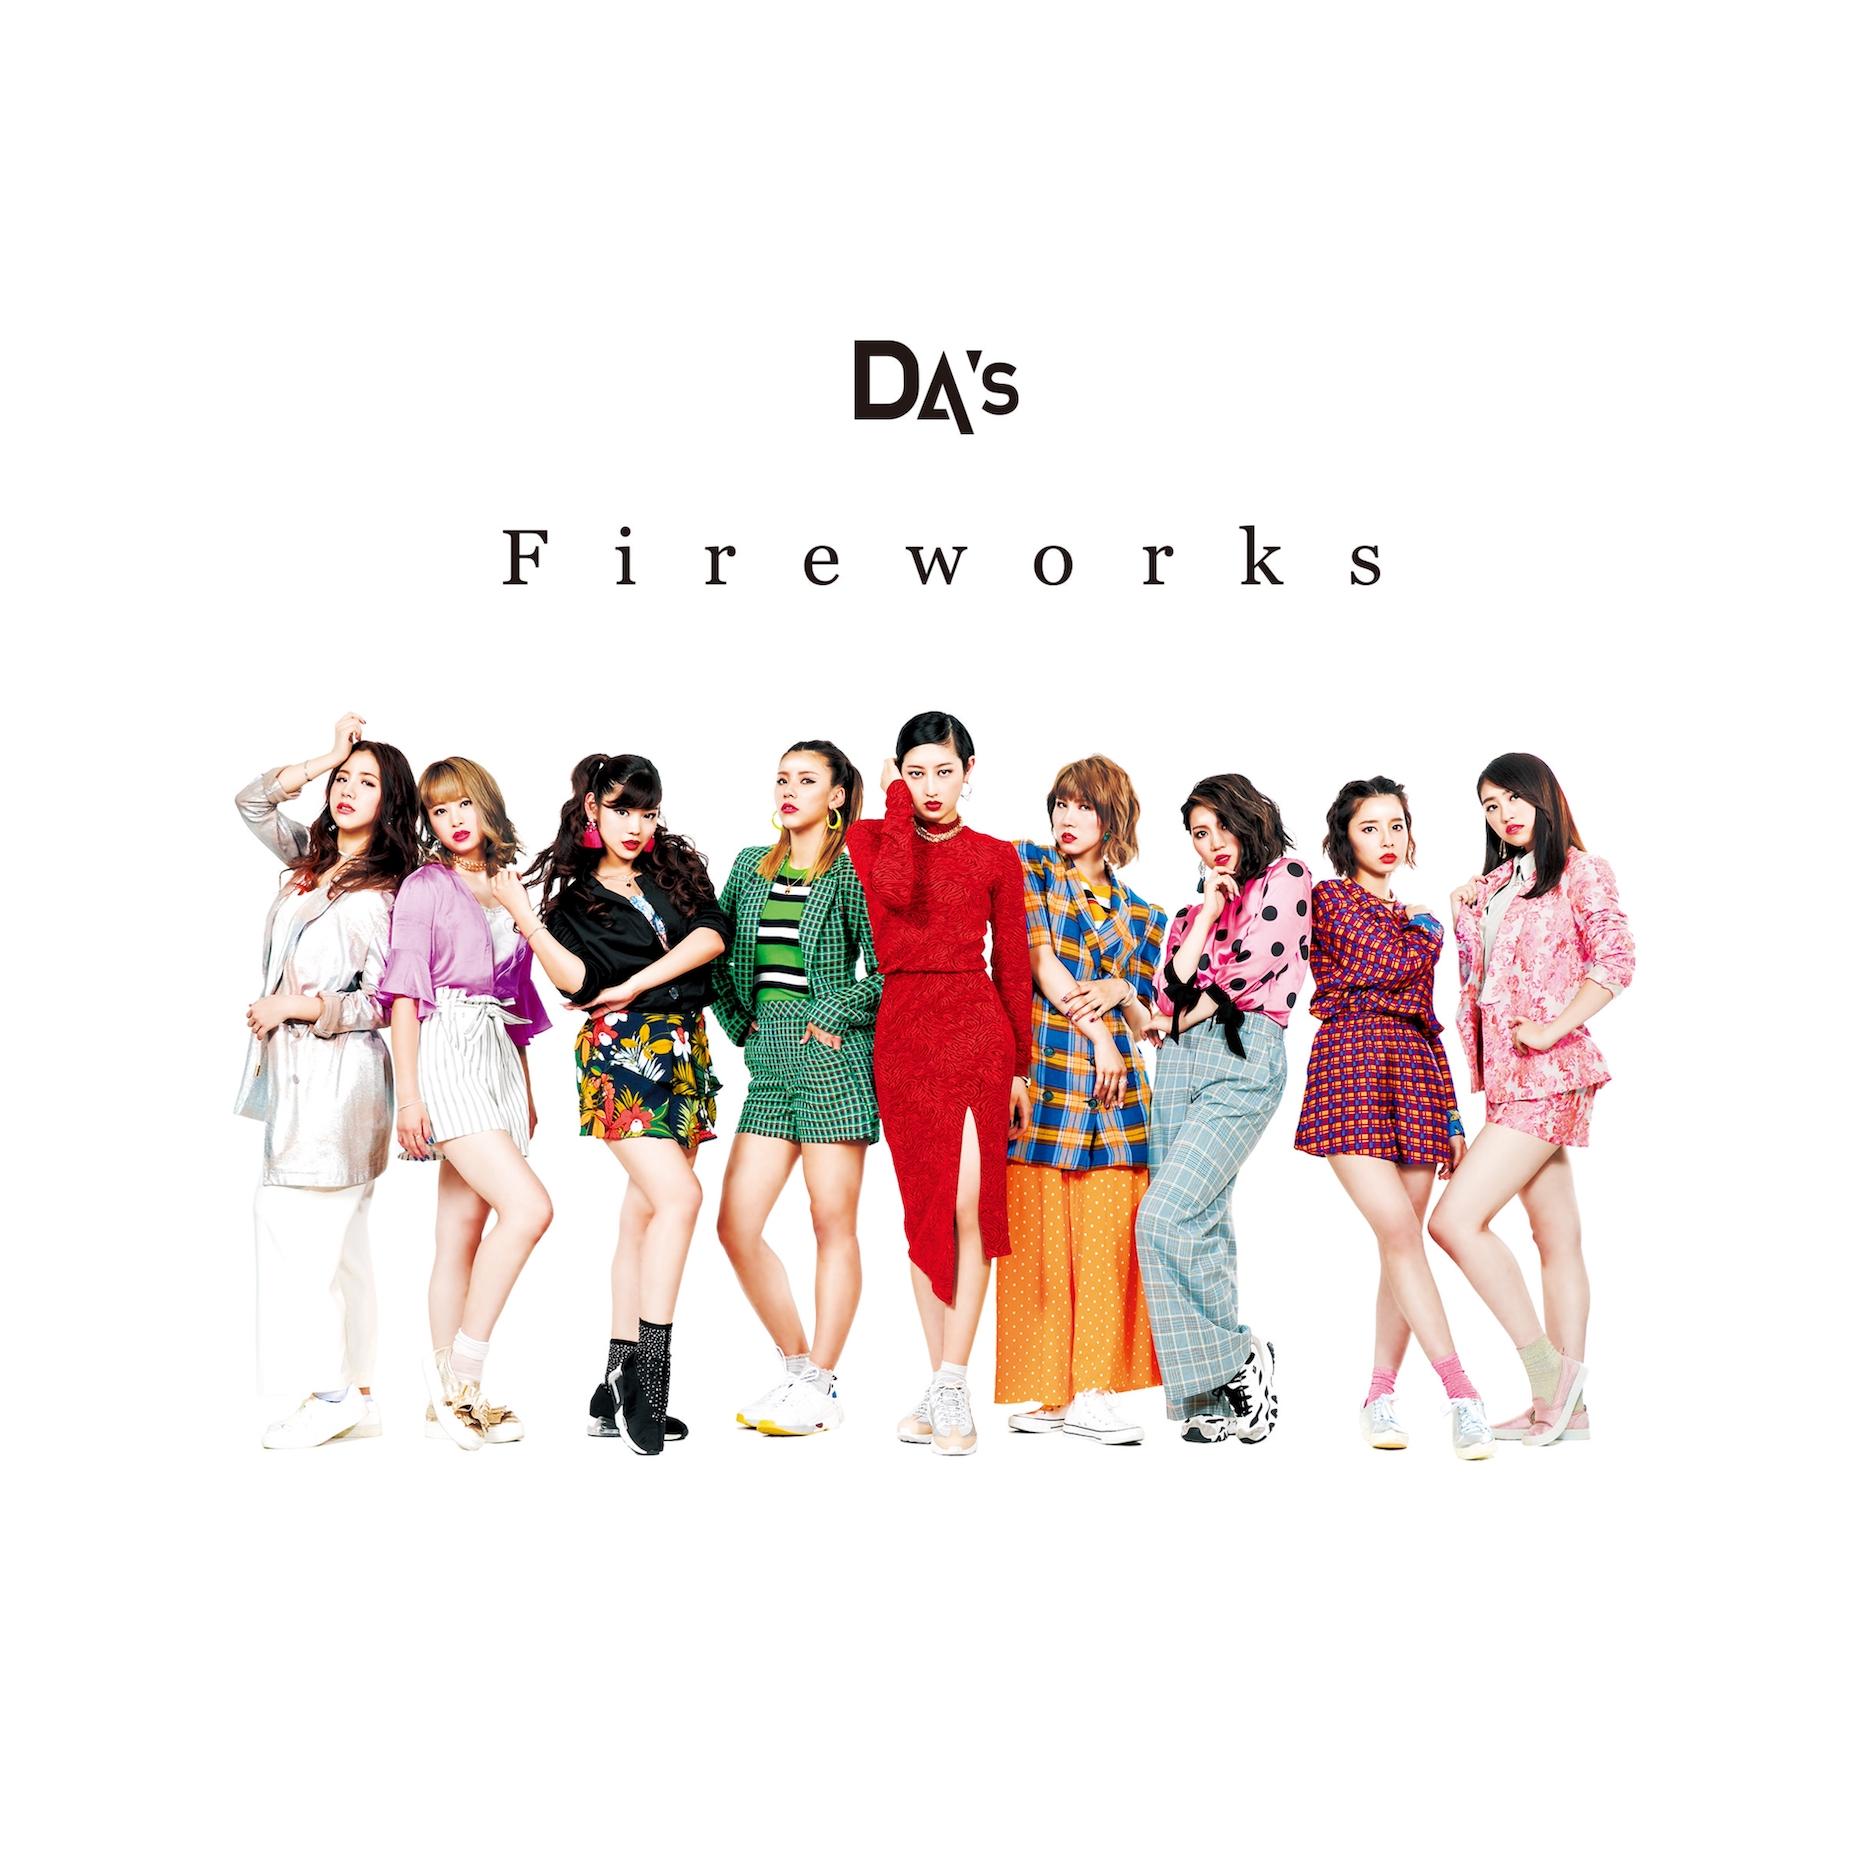 fireworks_DA's_cd